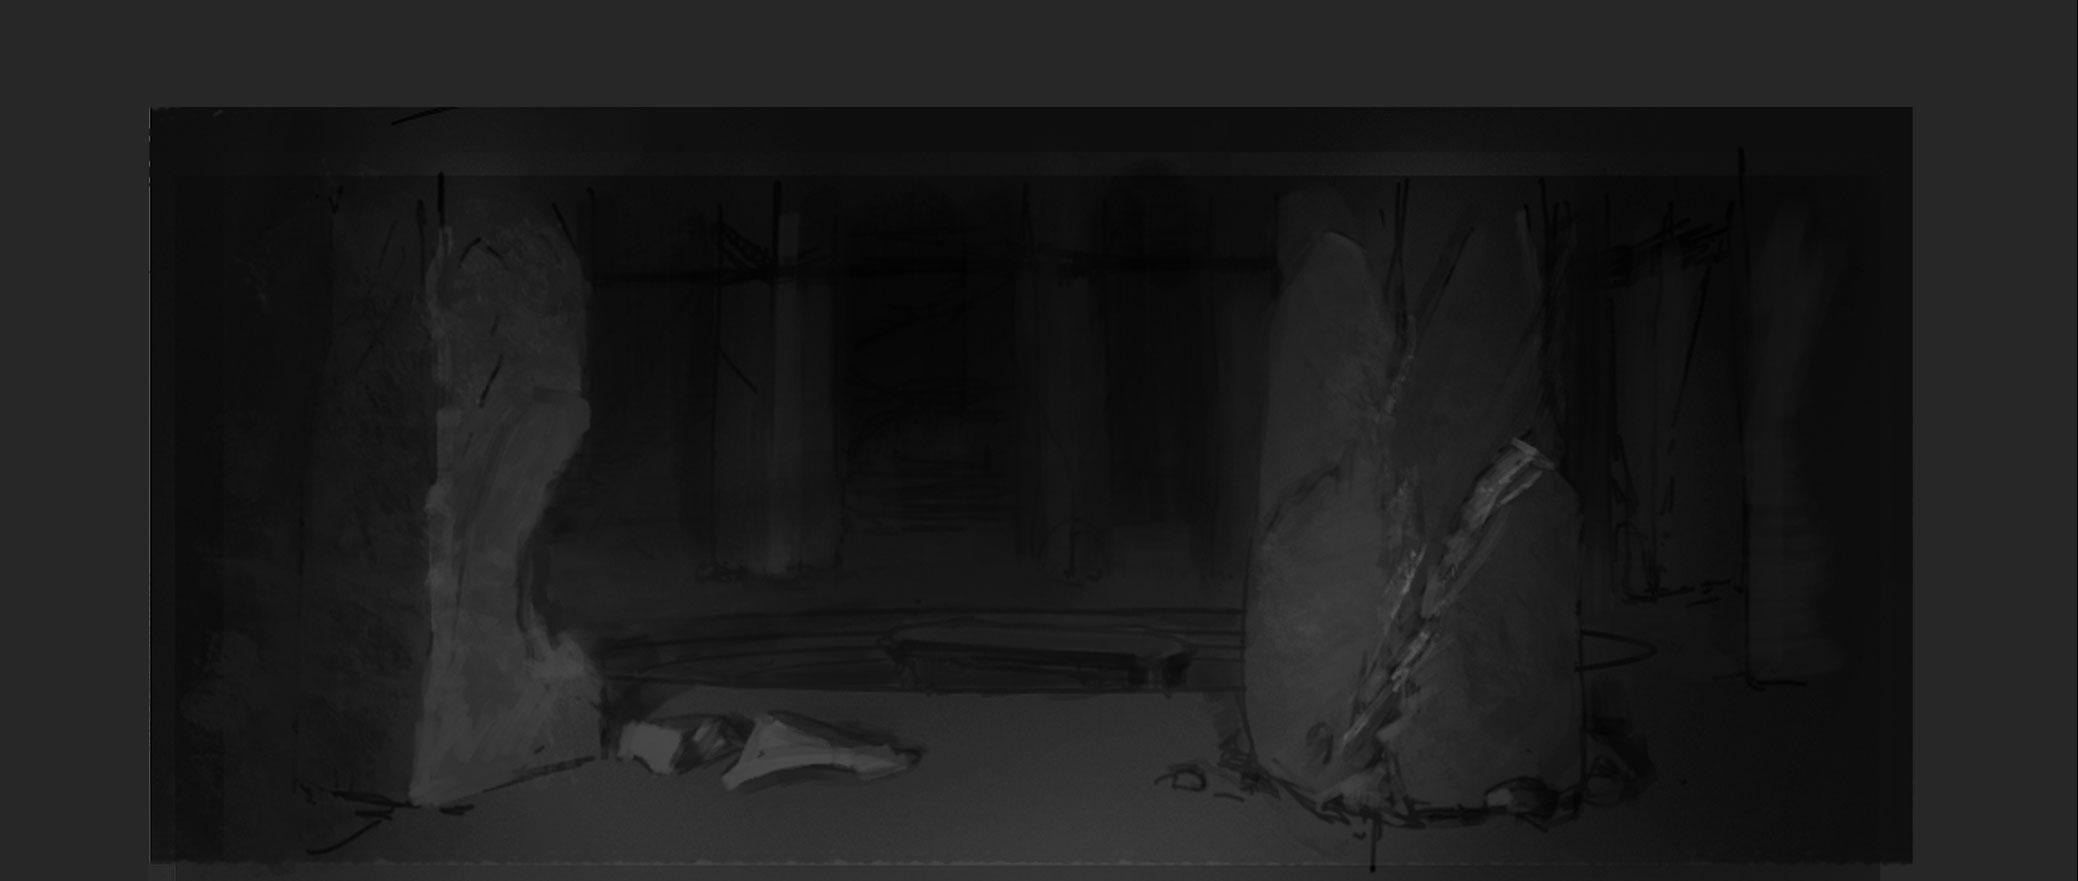 Wraiths_2019Animatic_Thumbsheet-02_91.jpg